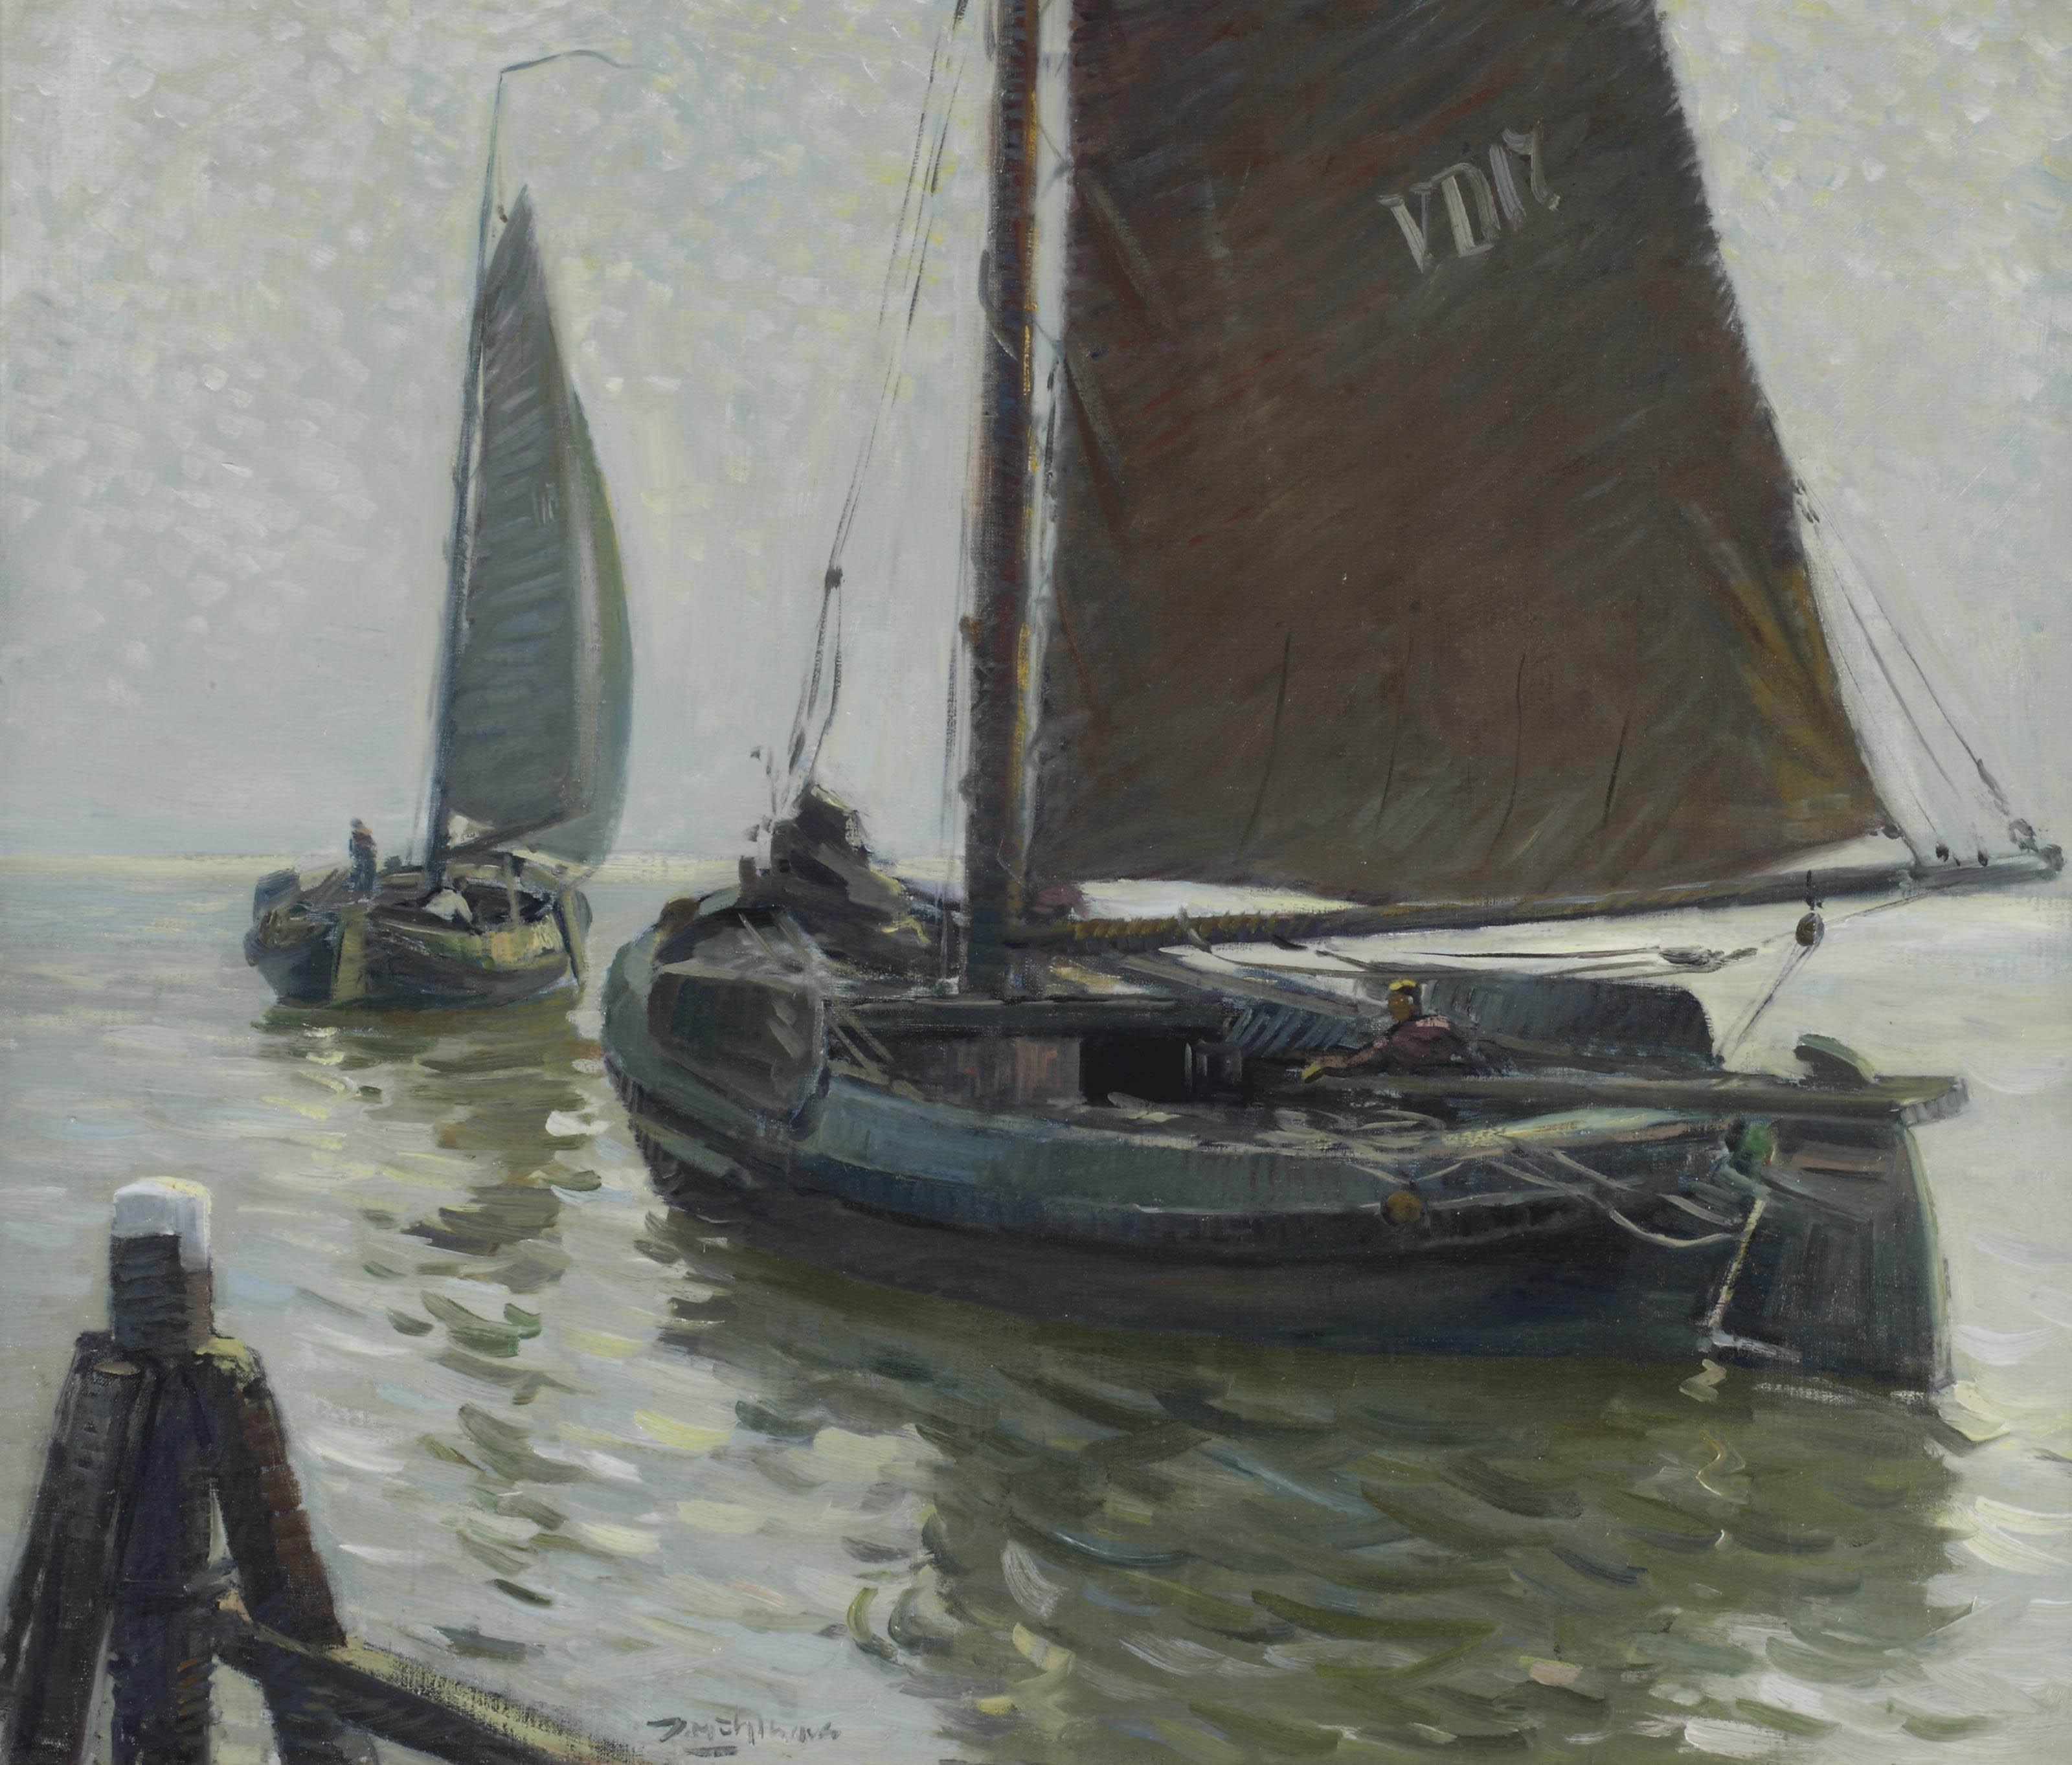 Volendam fishermen setting out to sea